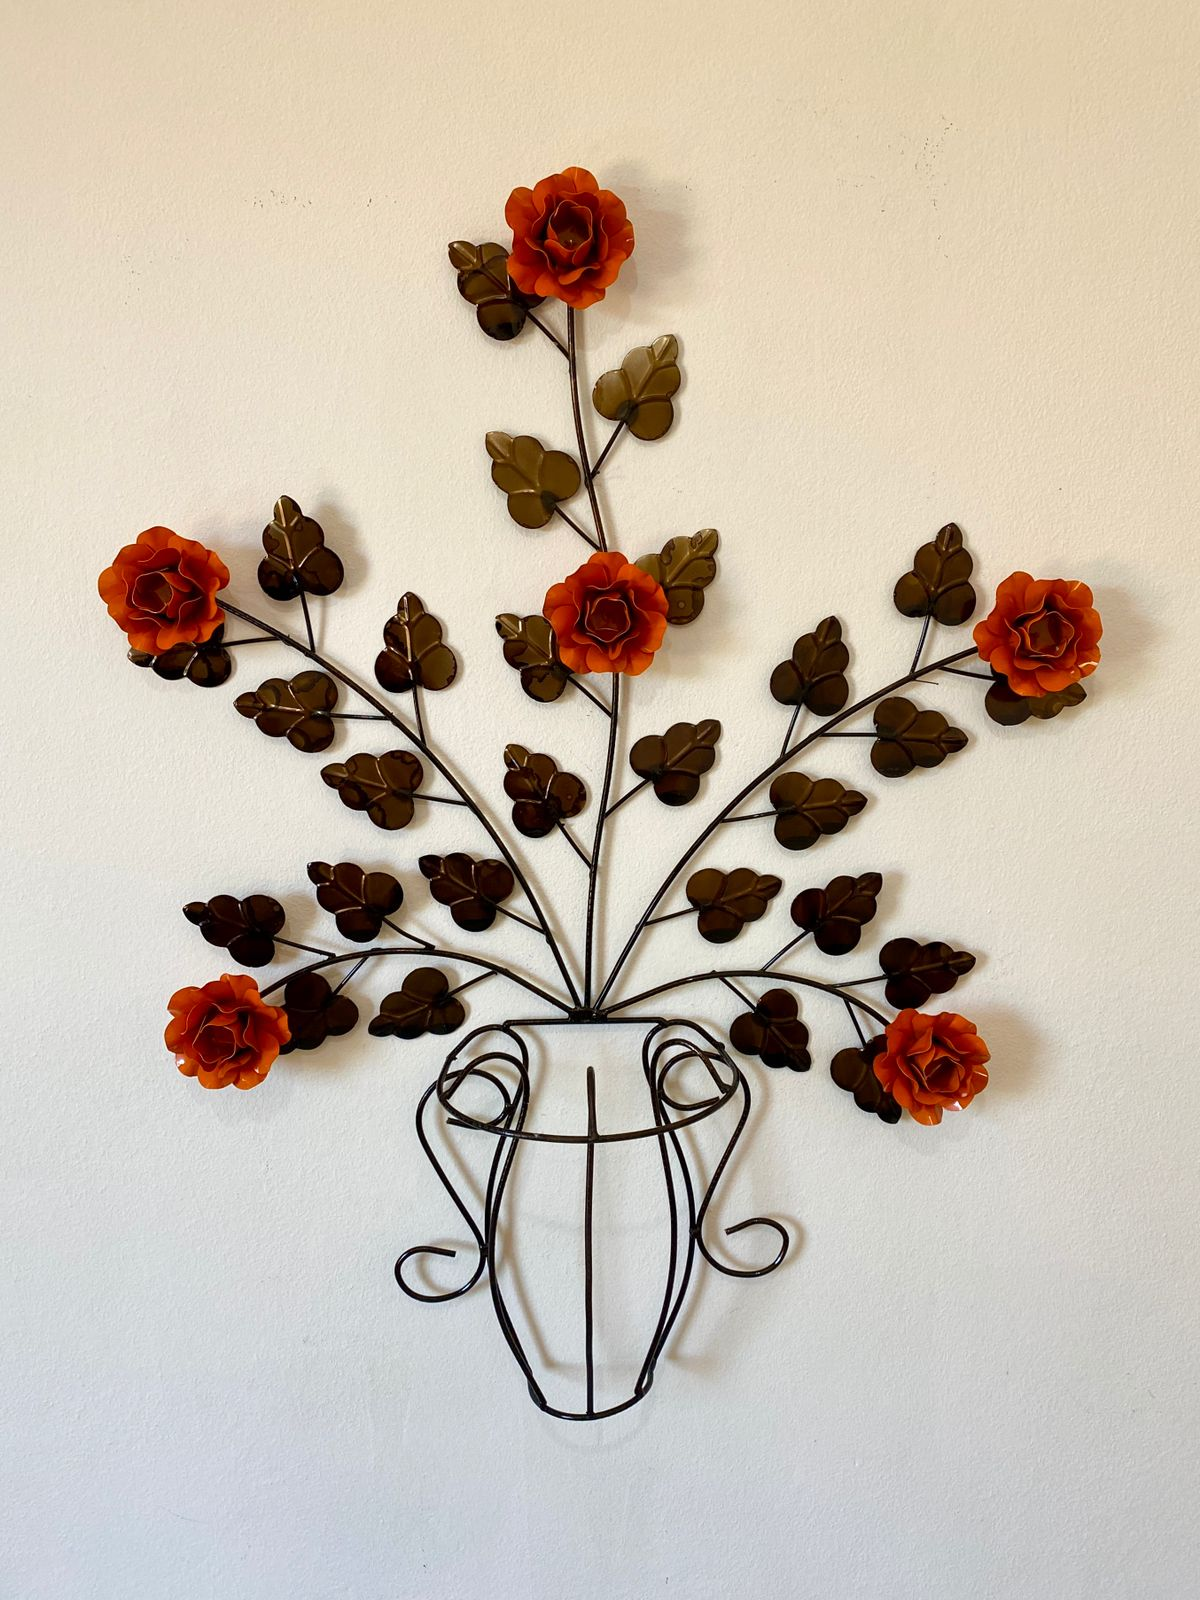 Moldura em Forma de Vaso de Flores Laranja